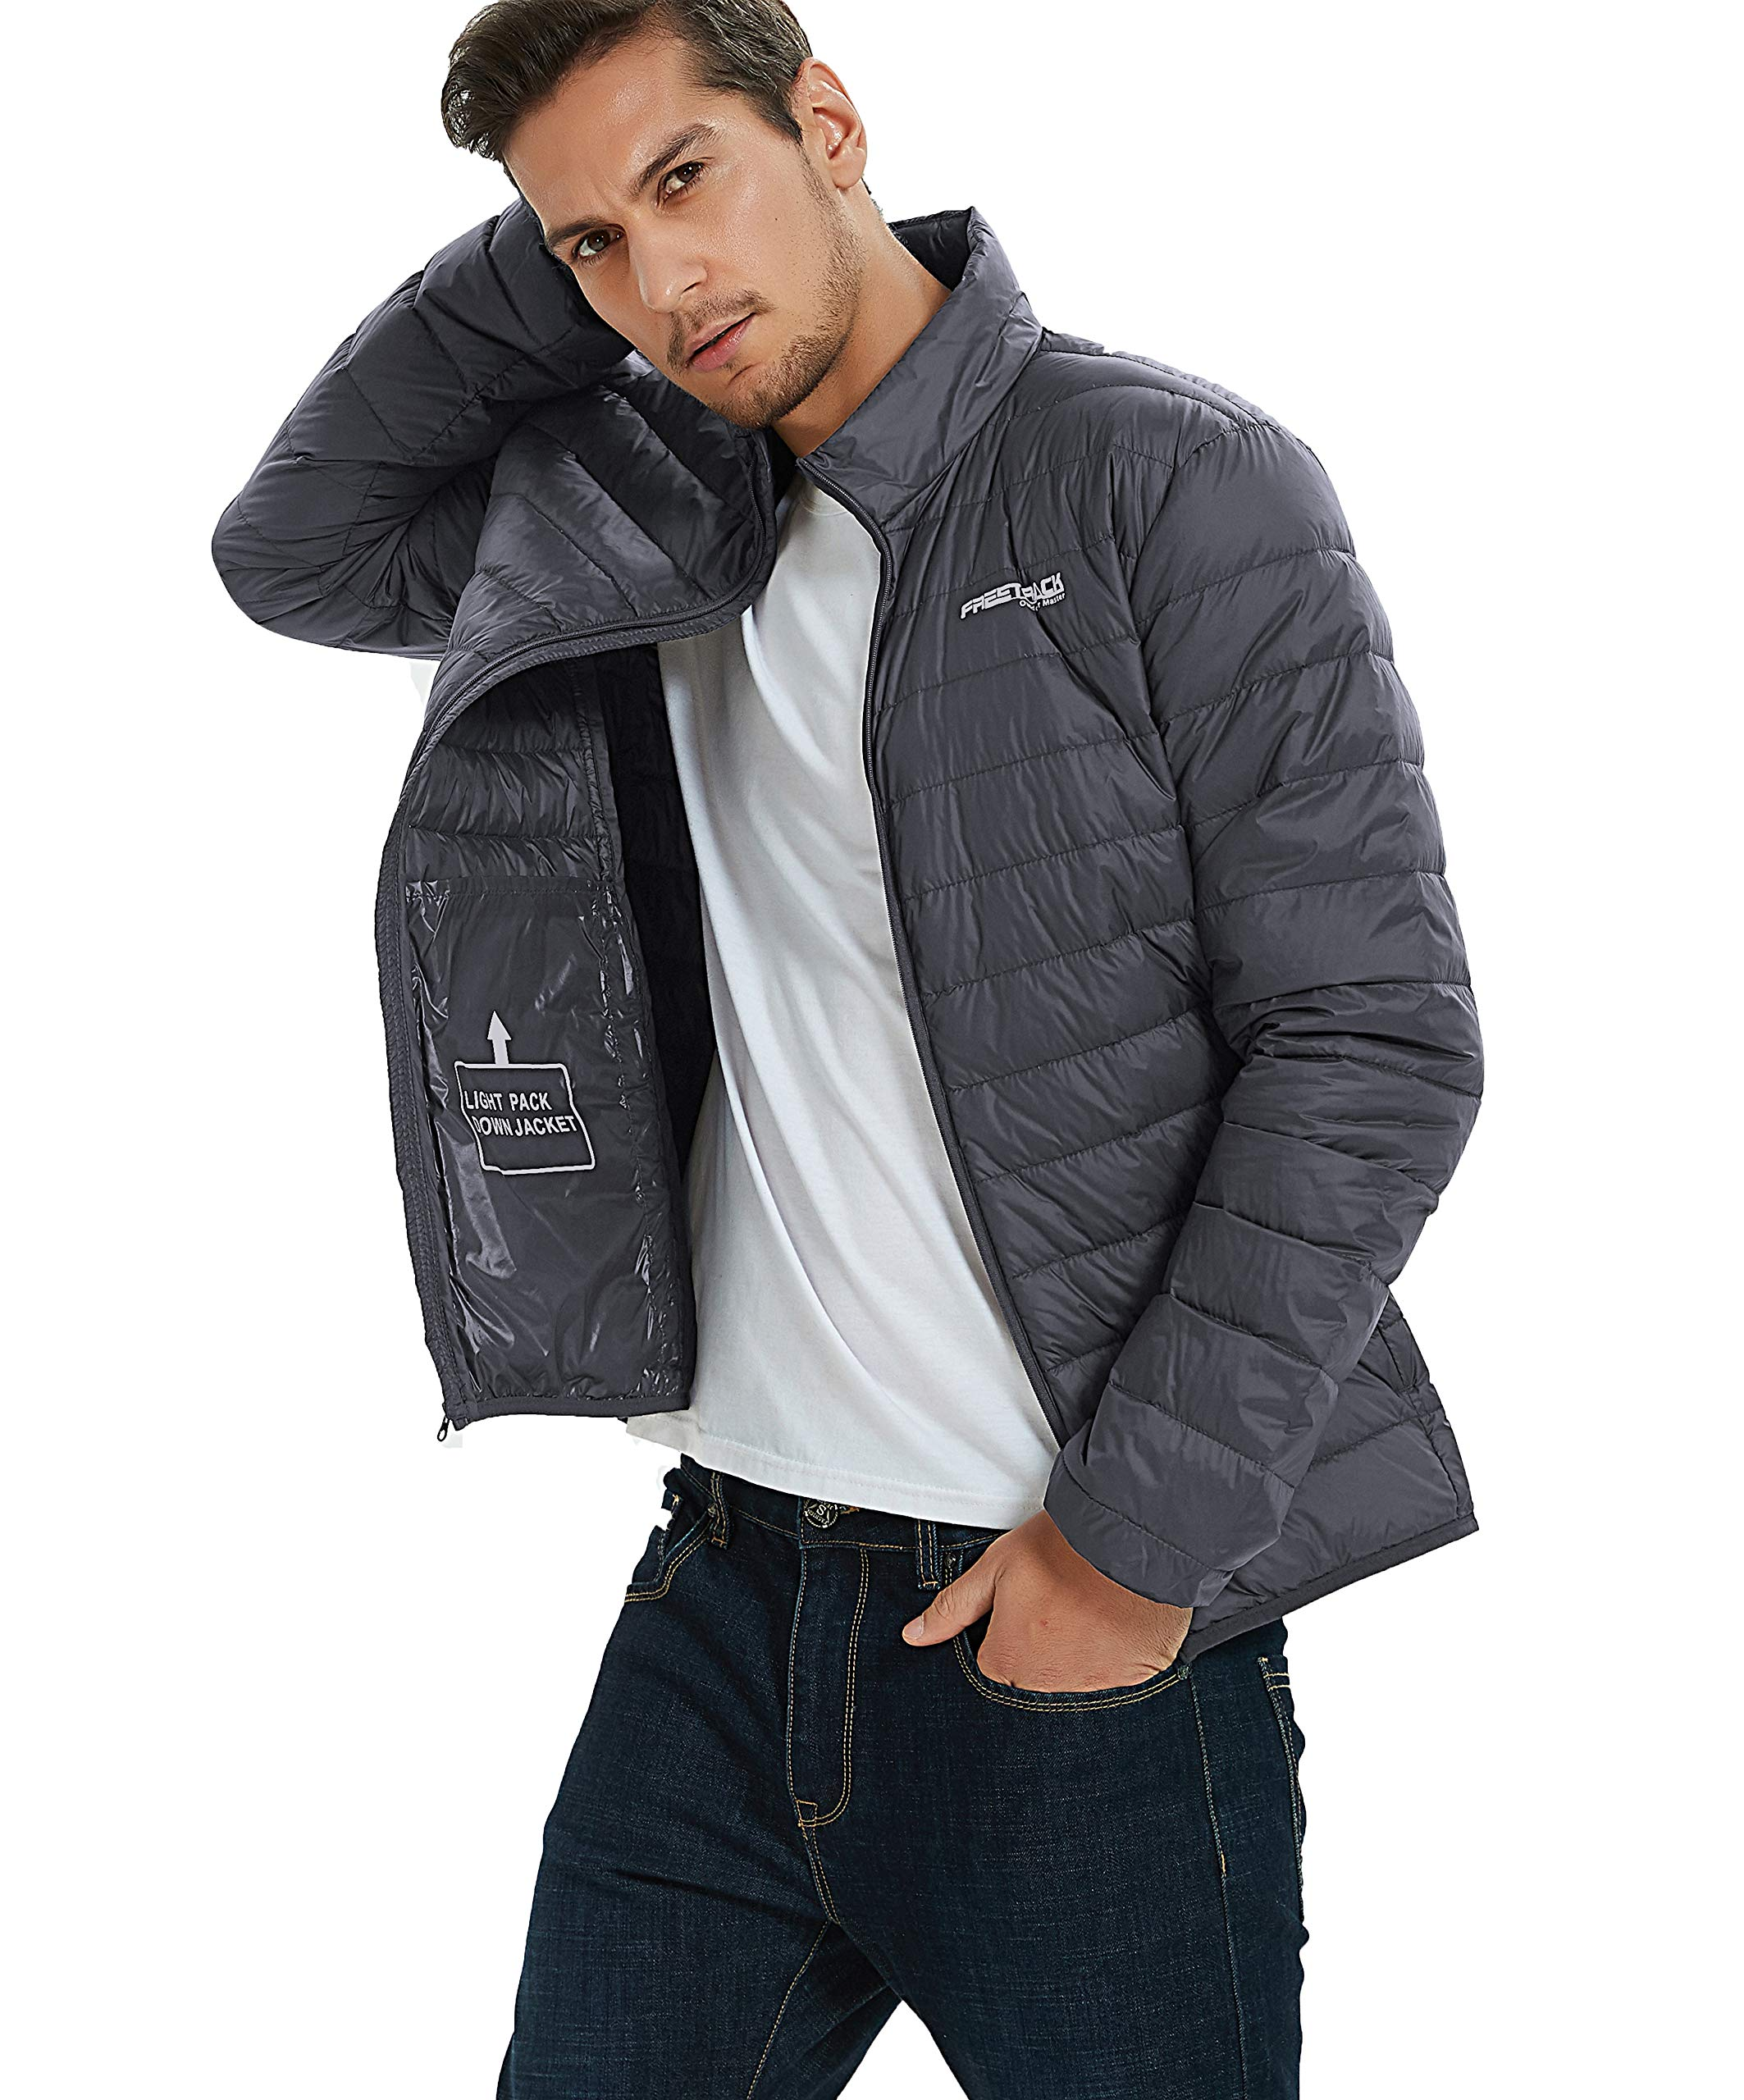 Freetrack Down Jackets for Men Insulated Puffer Packable Lightweight Jacket Winter Outdoor Coat